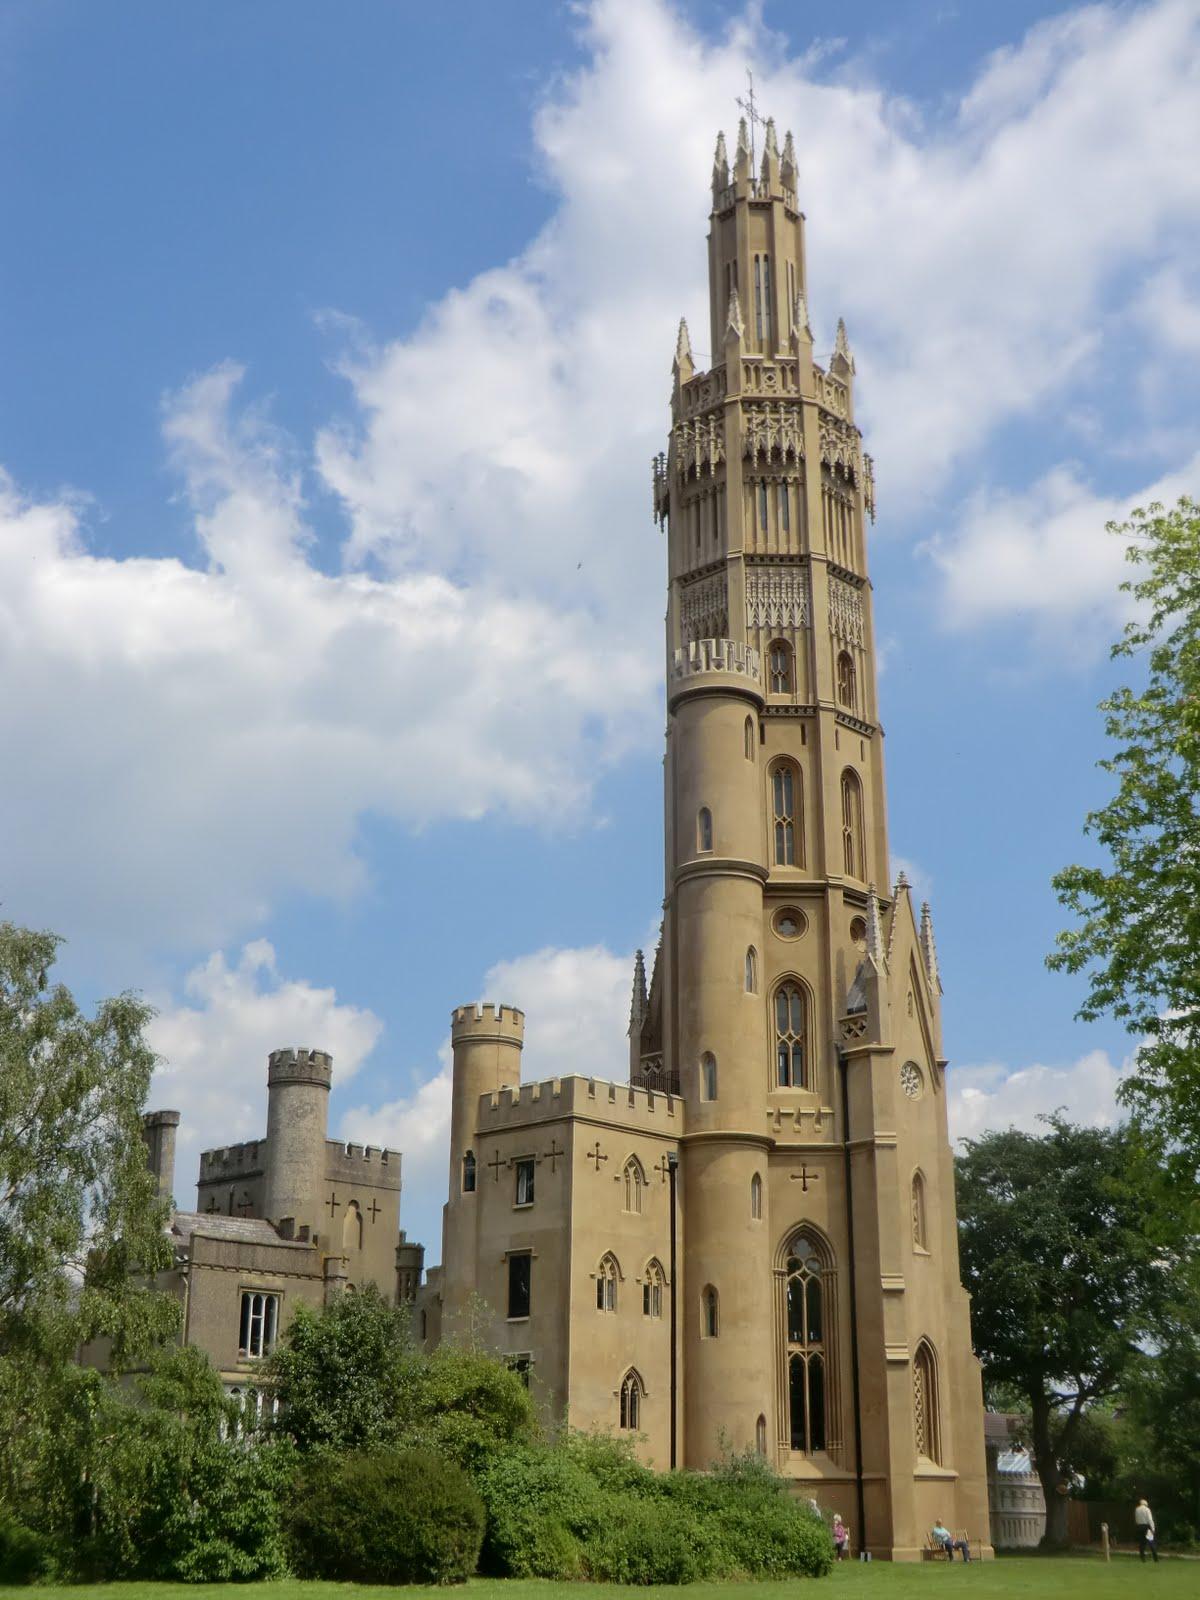 CIMG1134 Hadlow Tower